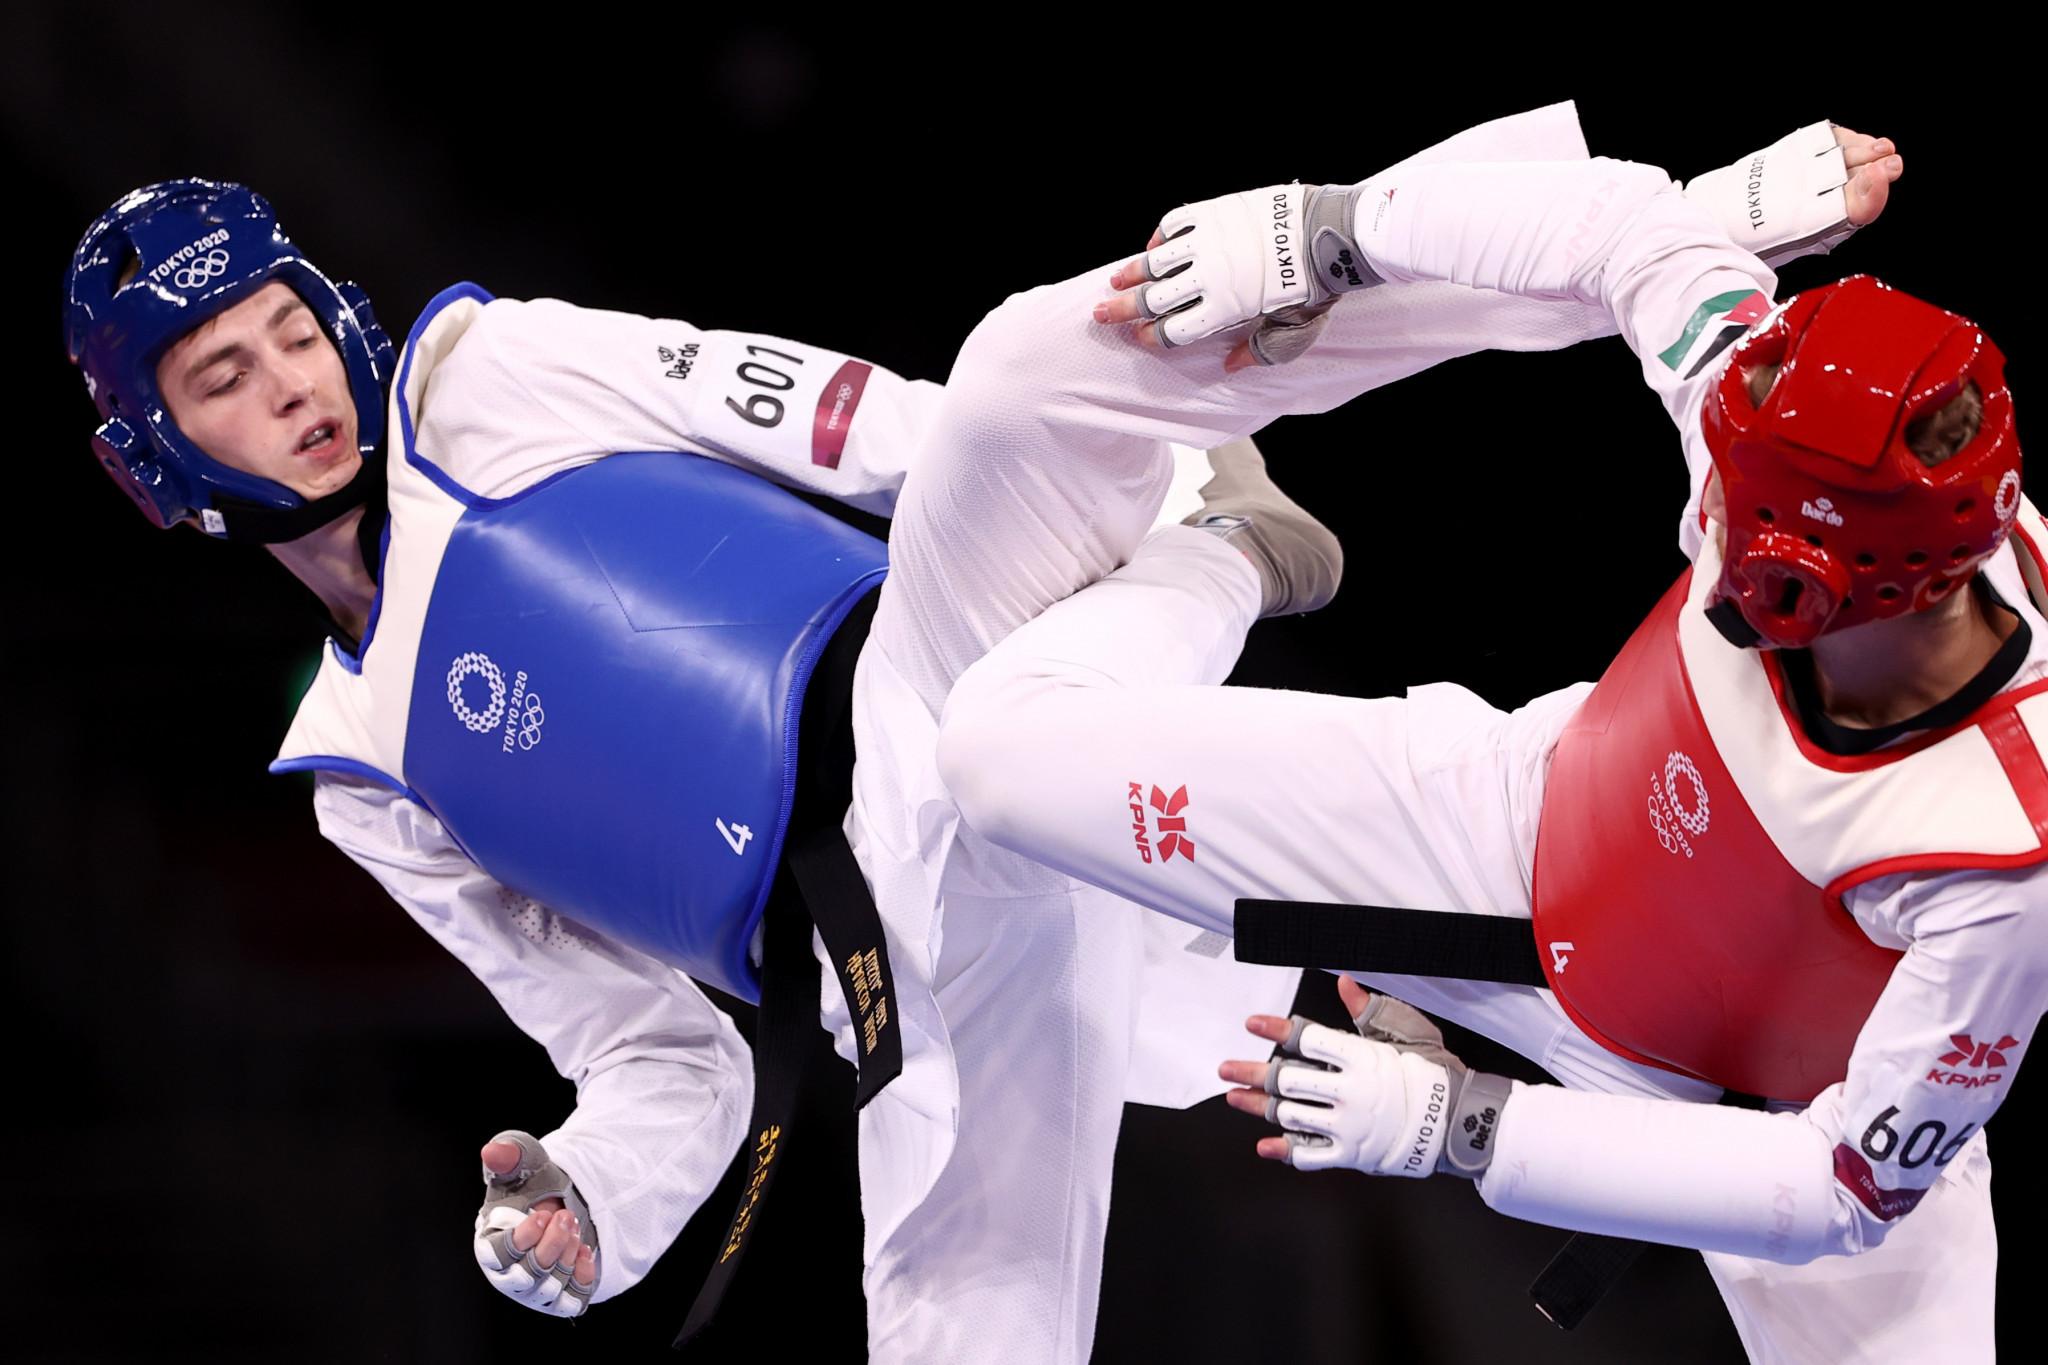 Maksim Khramtsov proved too strong for Saleh El-Sharabaty in the men's under-80kg final ©Getty Images